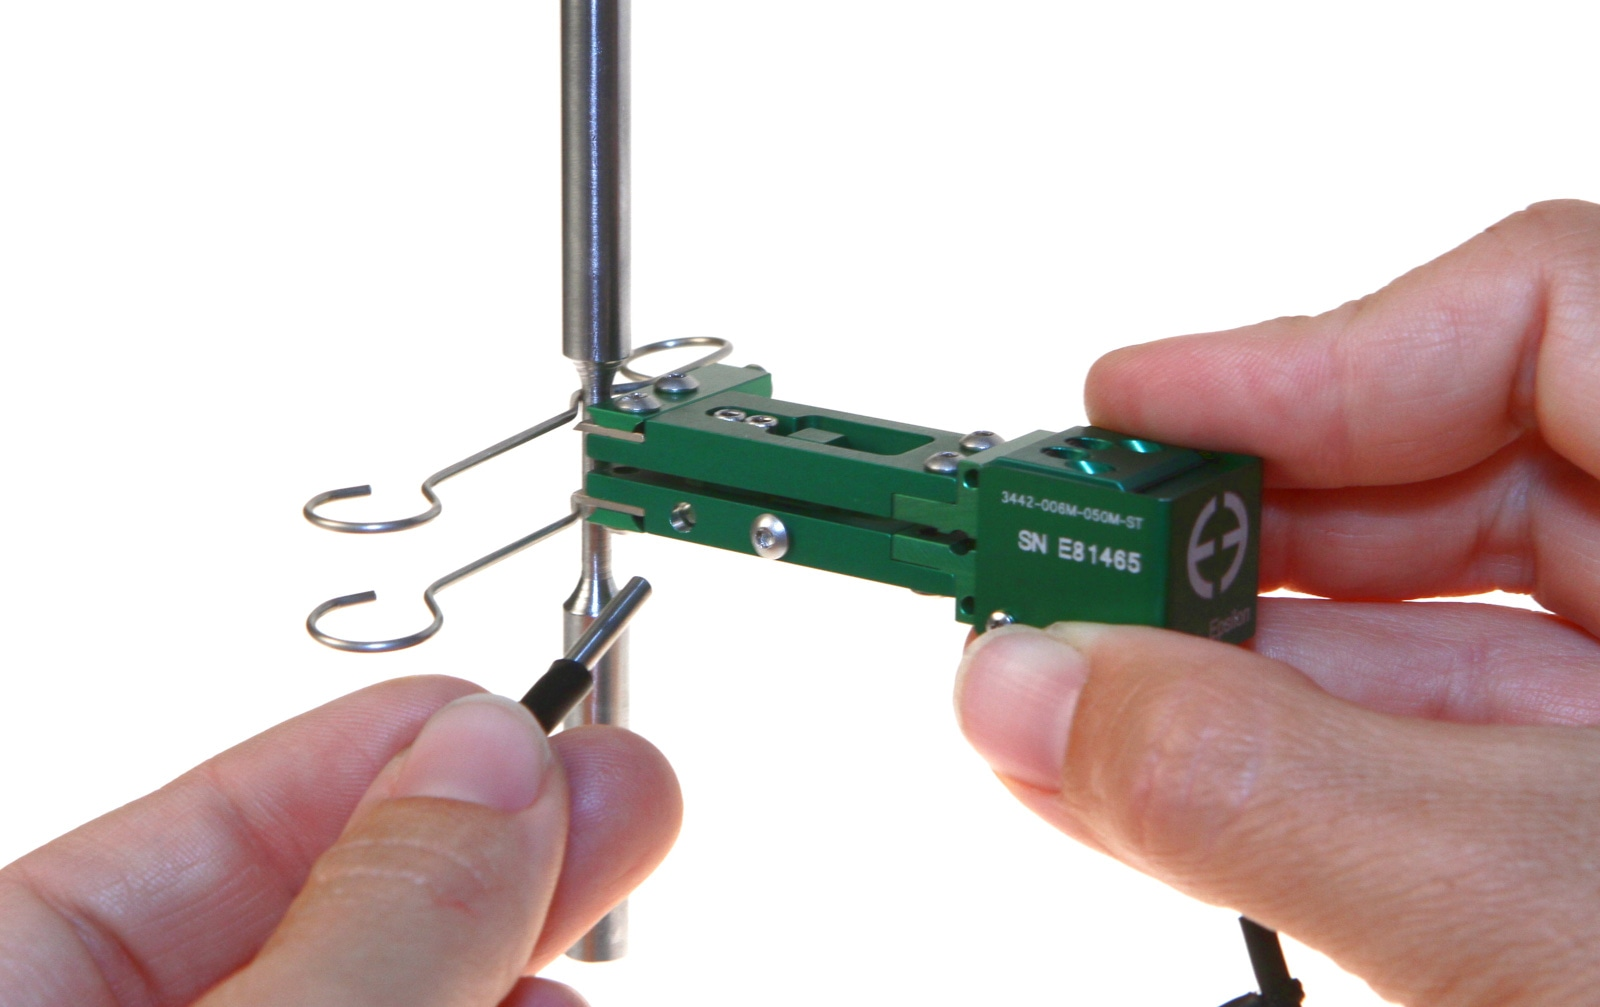 Epsilon 3442 Miniature Extensometer